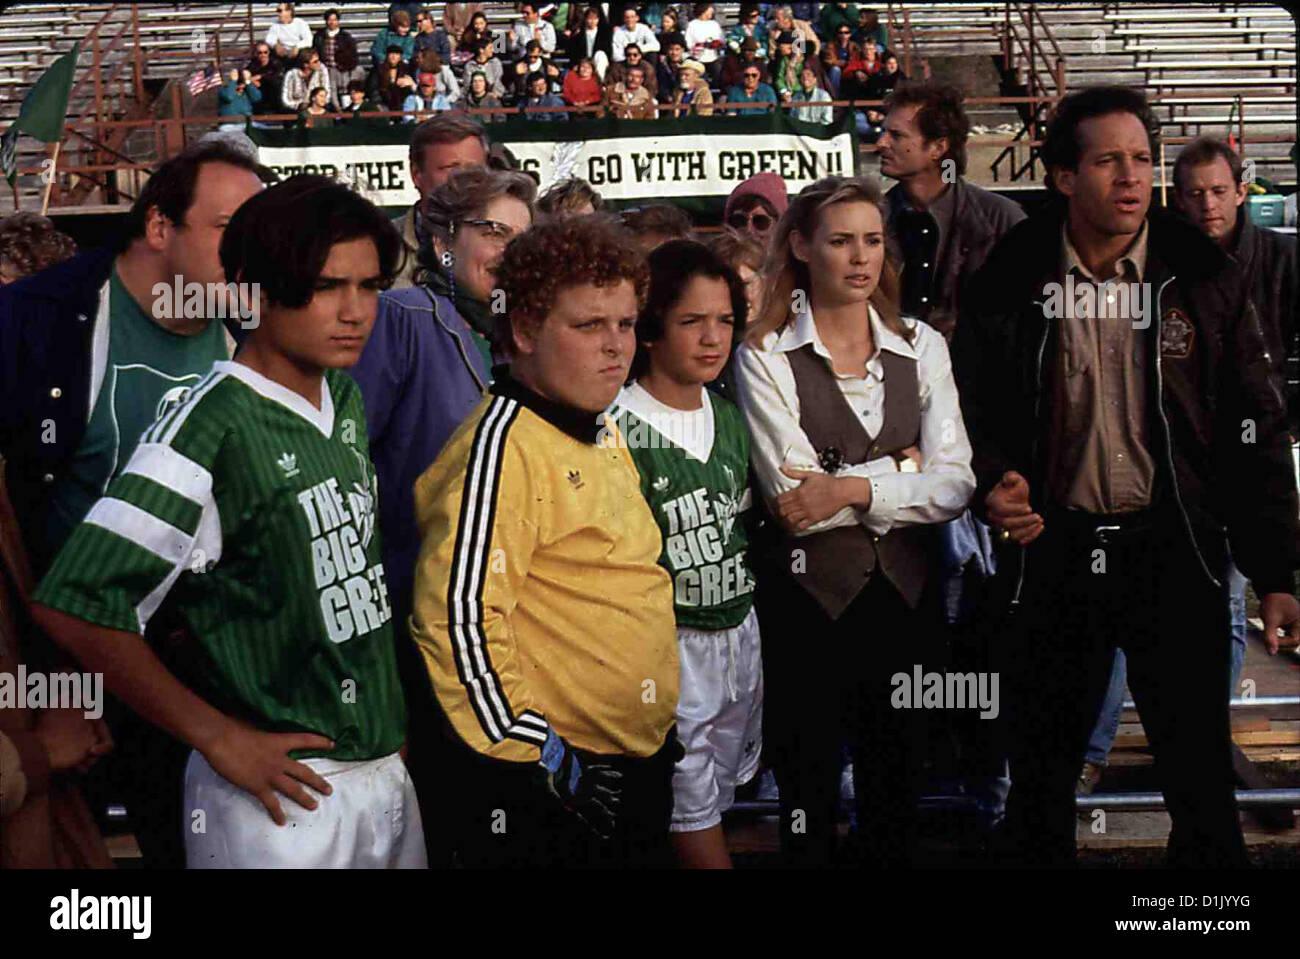 Il grande verde - Ein Unschlagbares Big Team Verde, Anthony Esquivel, Patrick Renna, Billy L. Sullivan, Olivia D'ABO, Immagini Stock